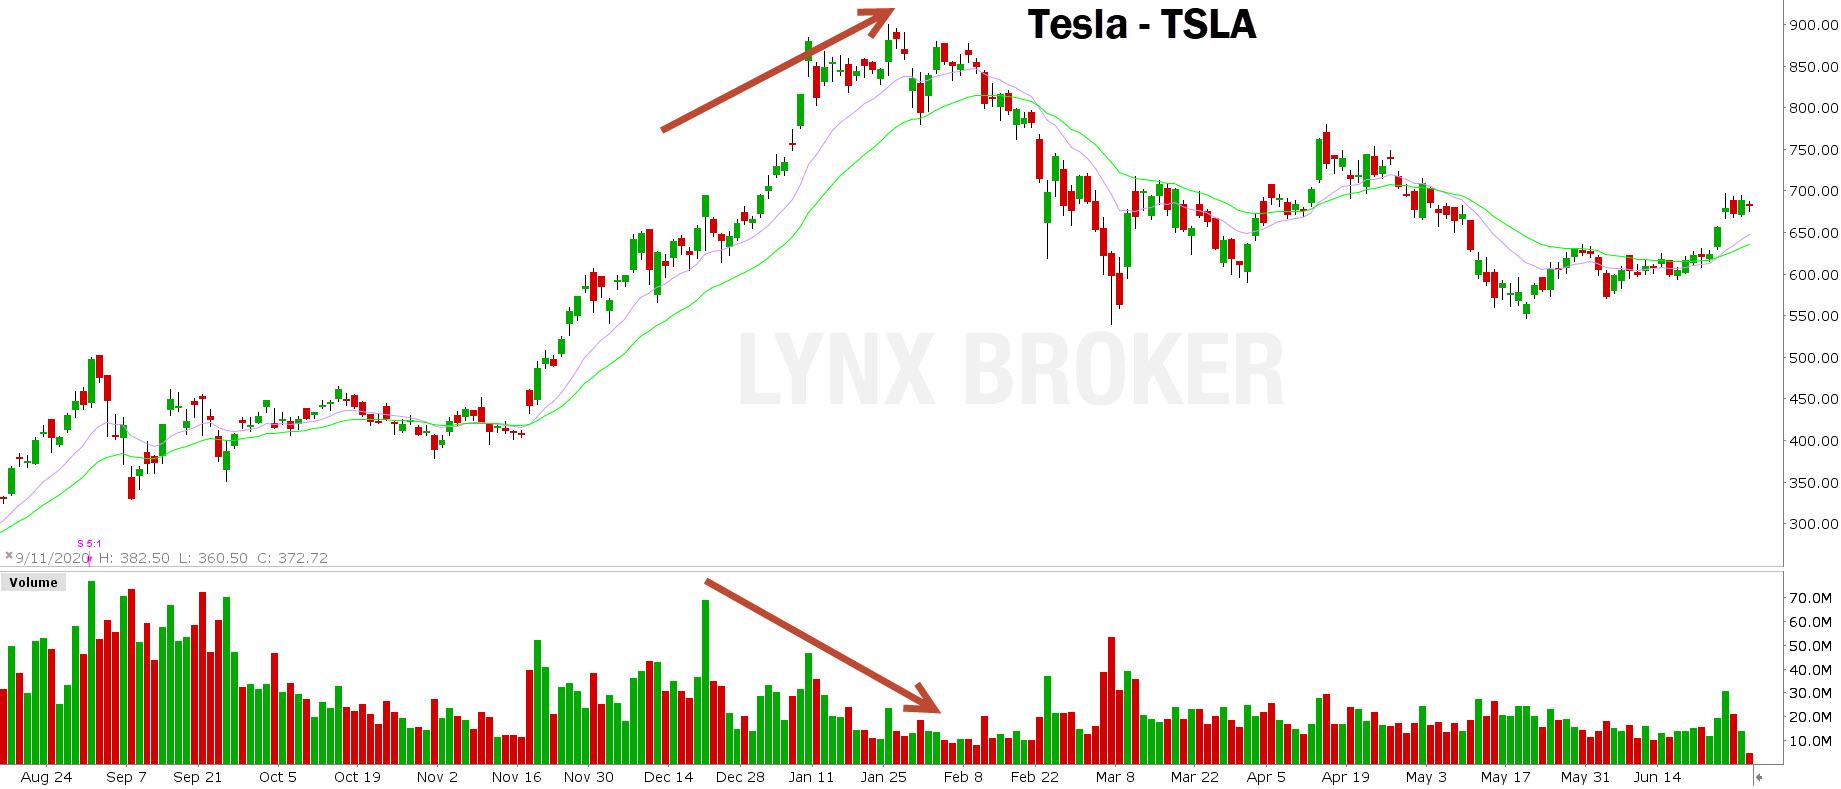 volume actions - volume trading - graphique Tesla